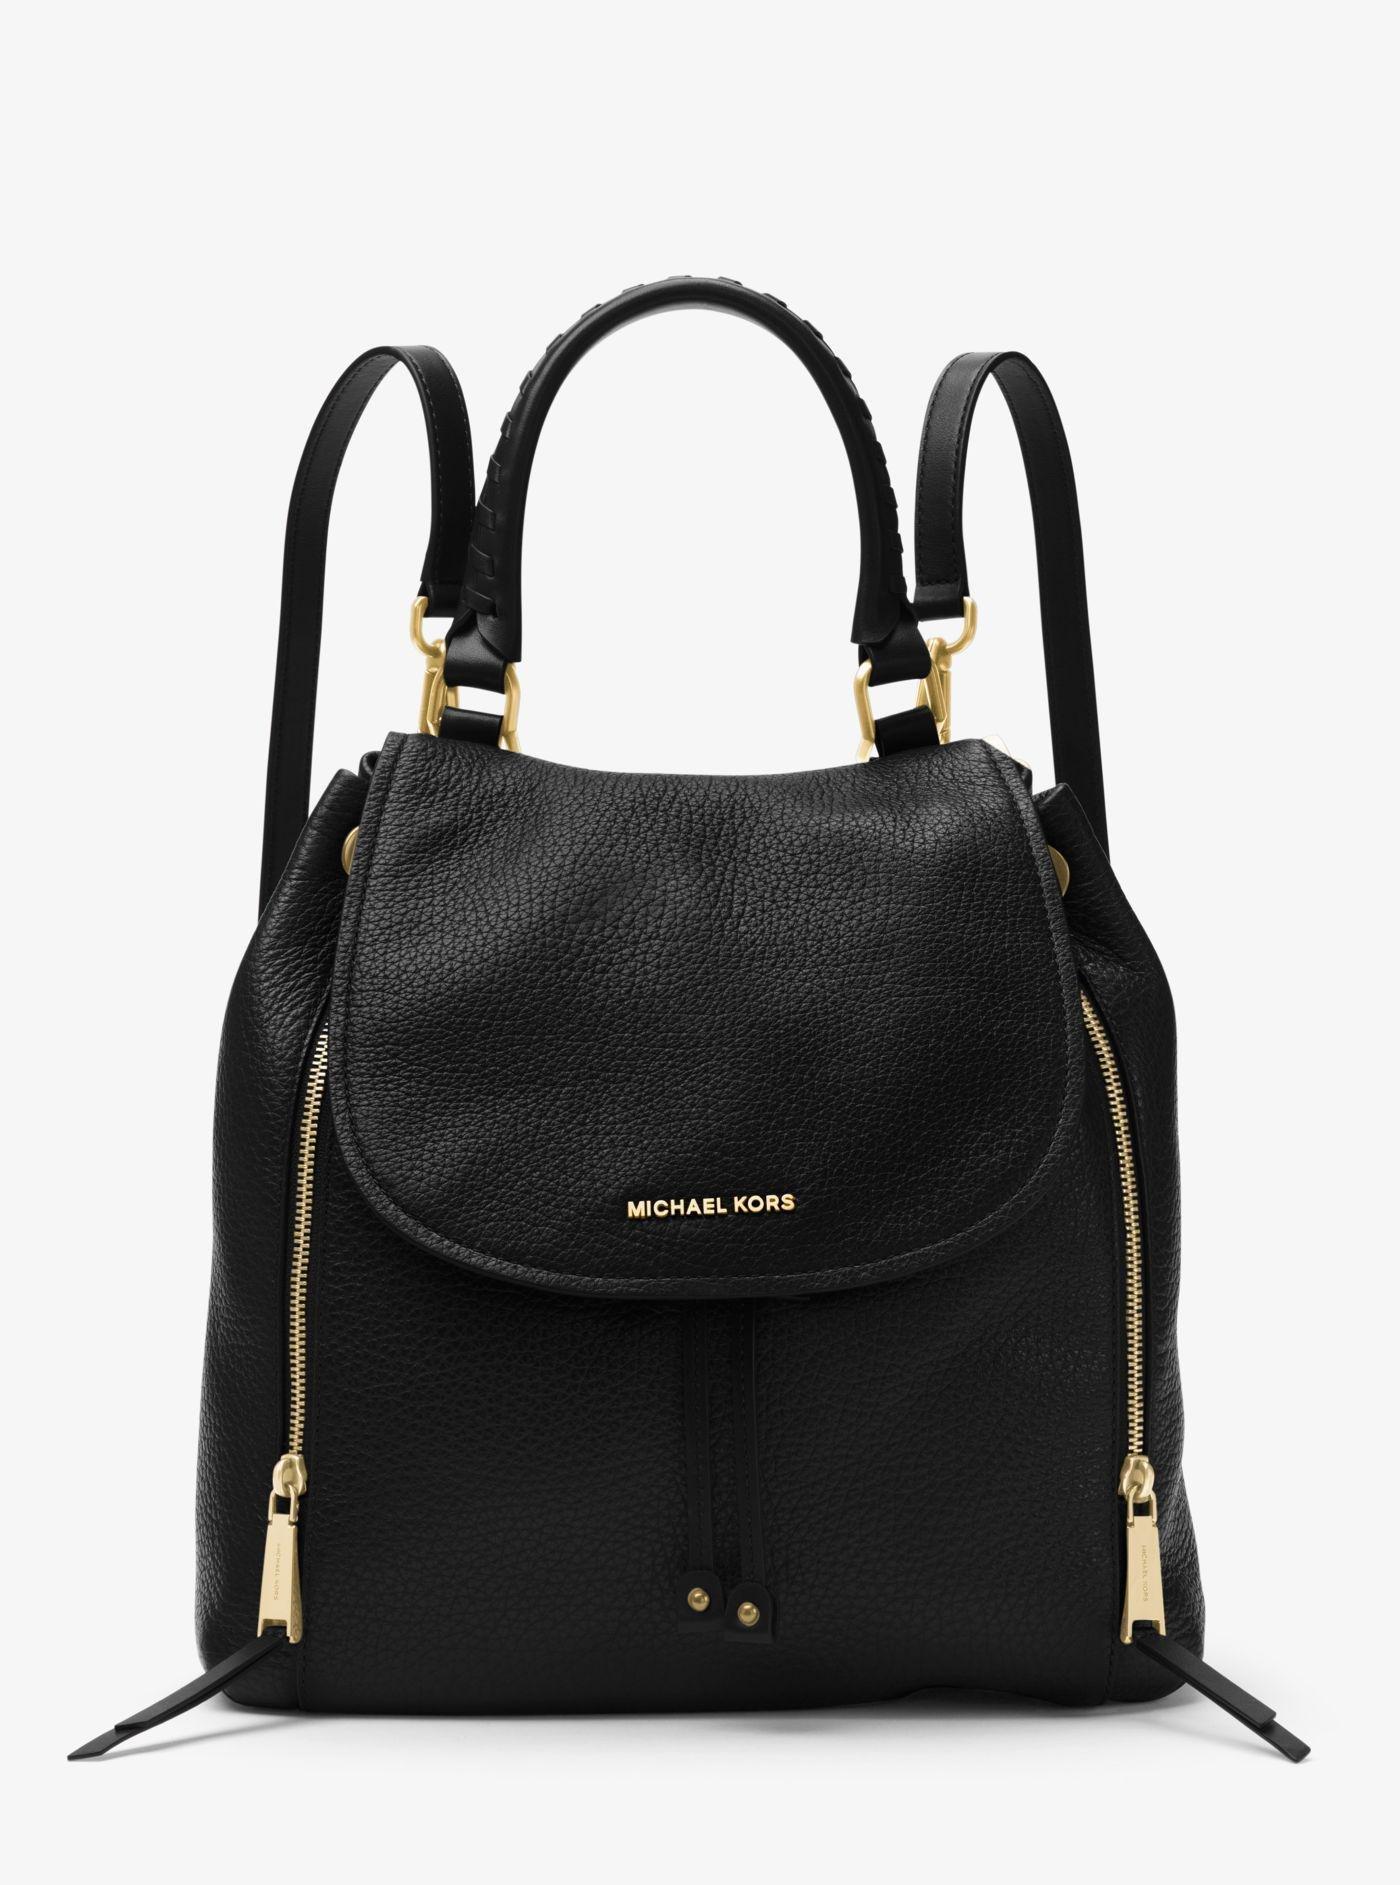 4557ba269206f ... discount michael kors black viv large leather backpack lyst. view  fullscreen e33ff 8ee6b